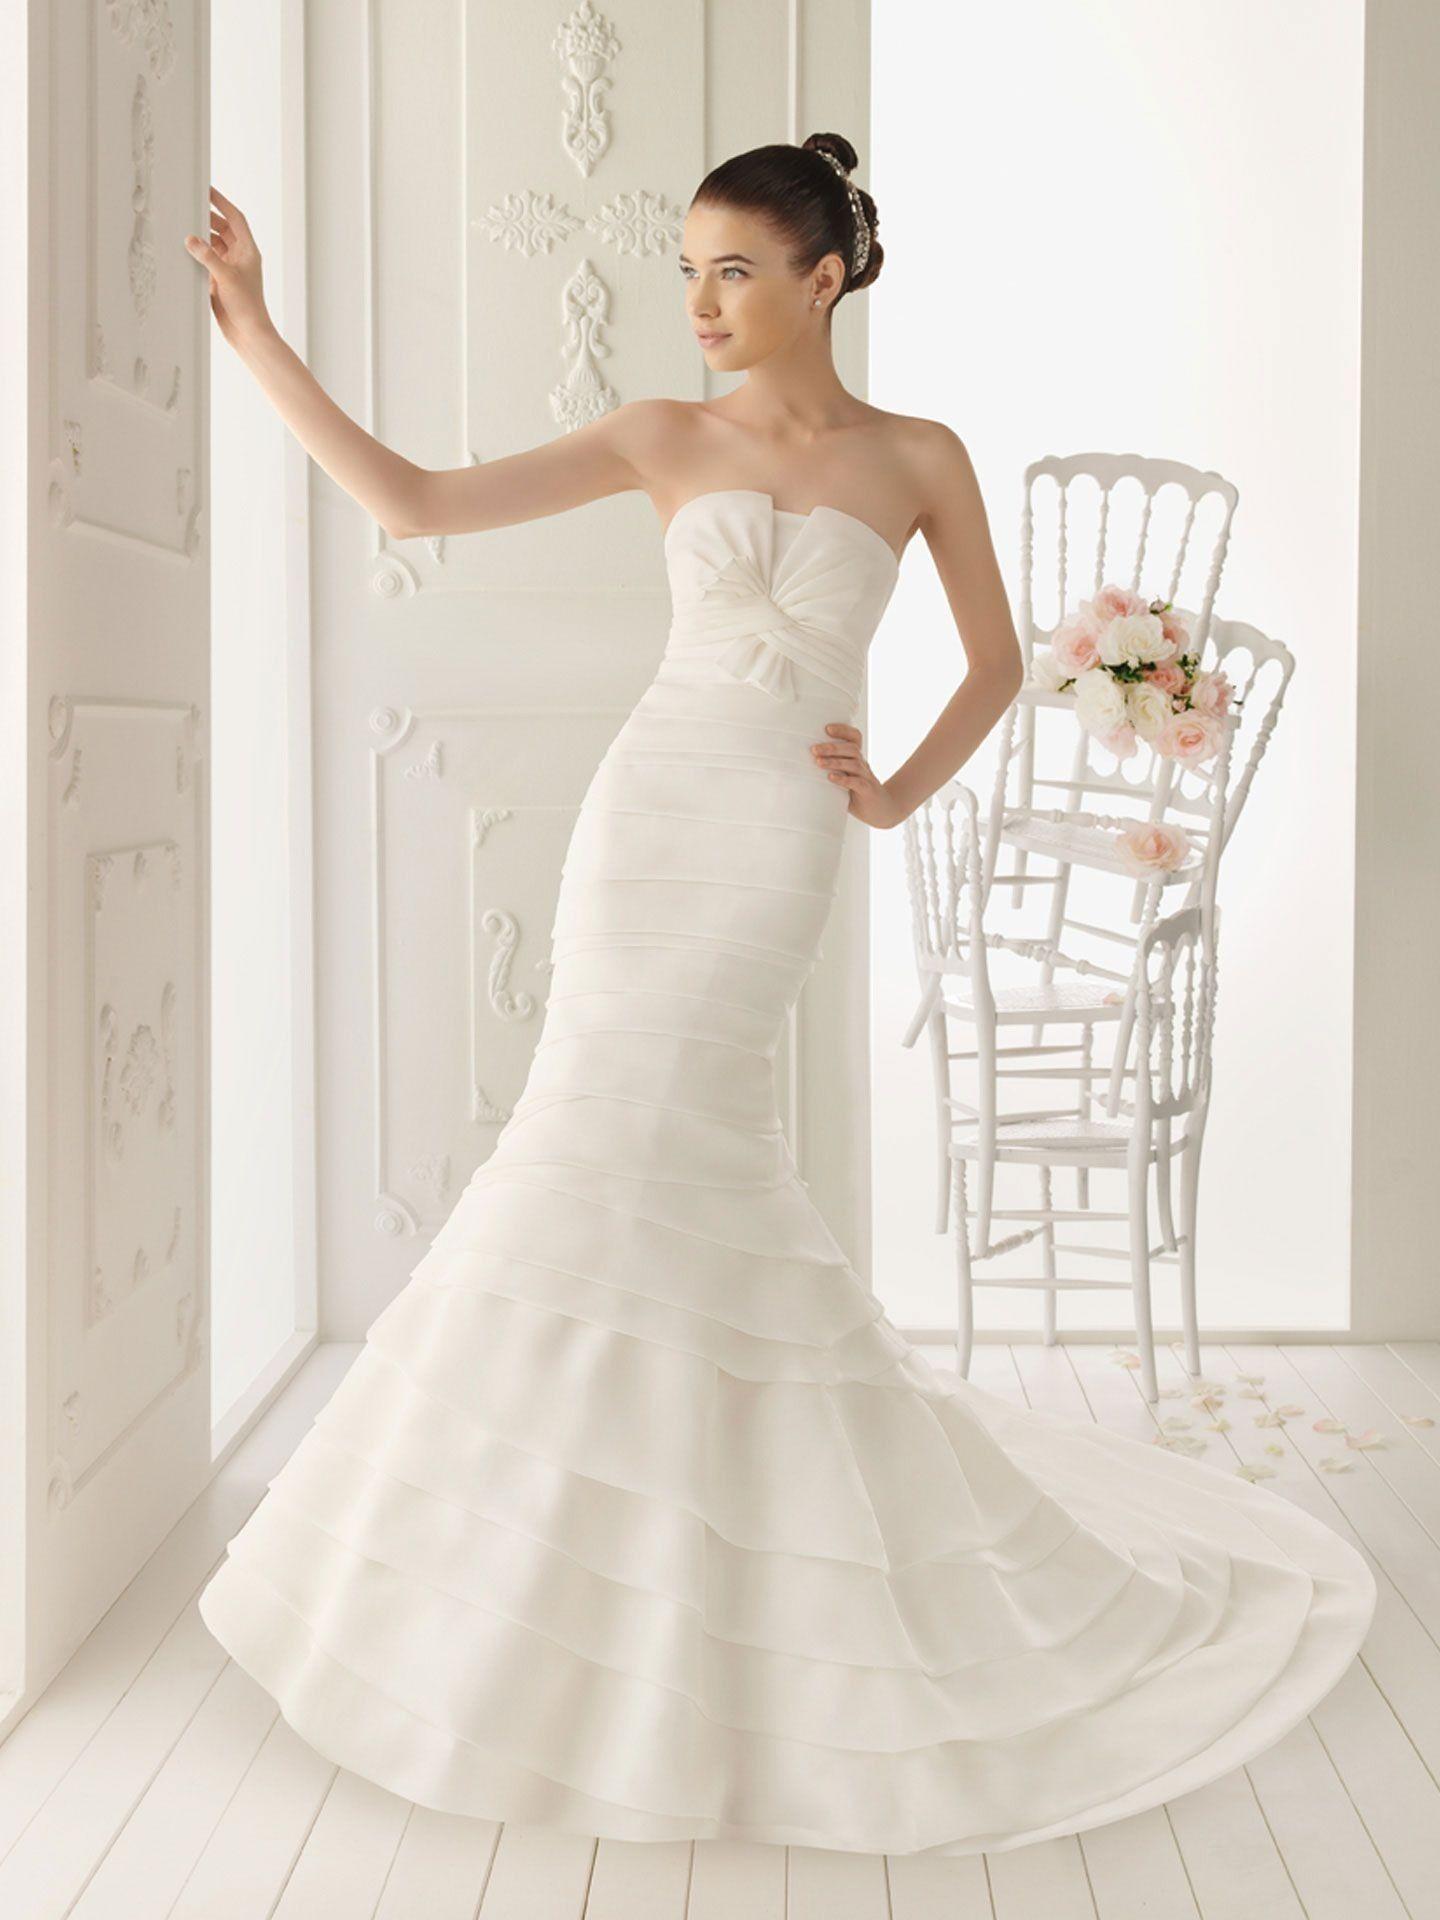 A tight flowy dress with an little bow | Wedding dresses | Pinterest ...